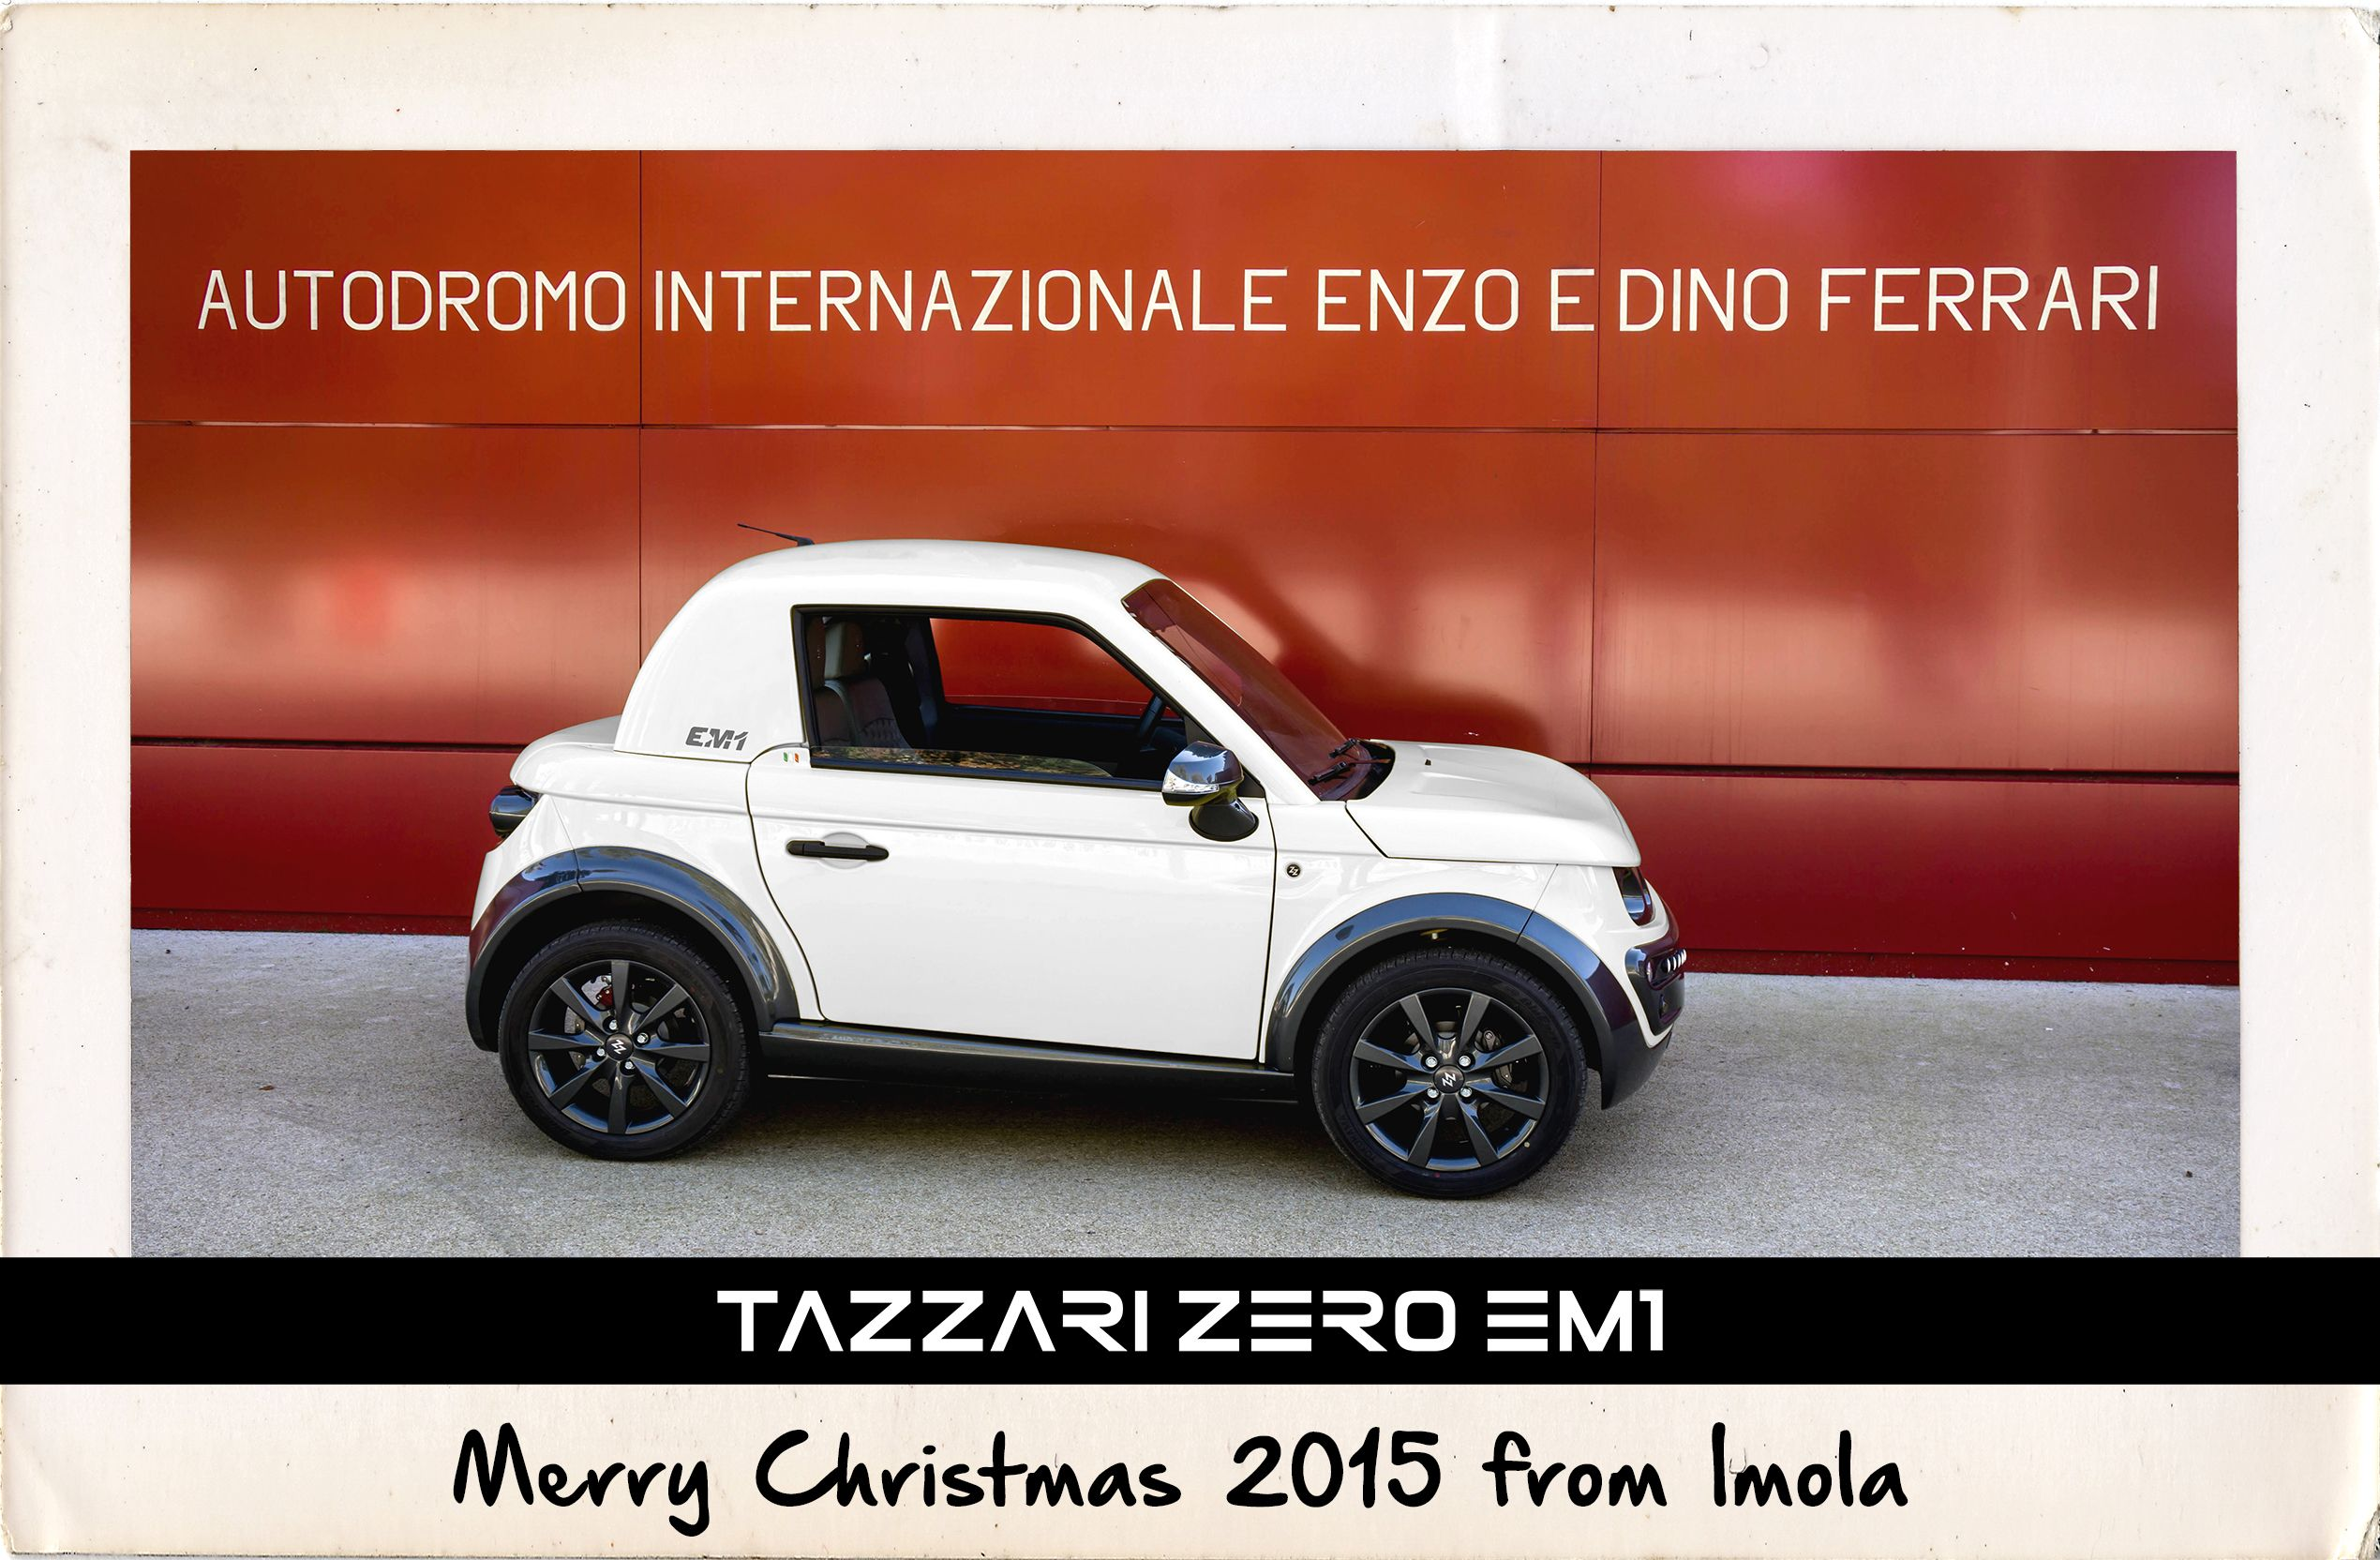 Merry Christmas 2015 from Imola WWW.TAZZARI-ZERO.COM #TAZZARI #ZERO ...